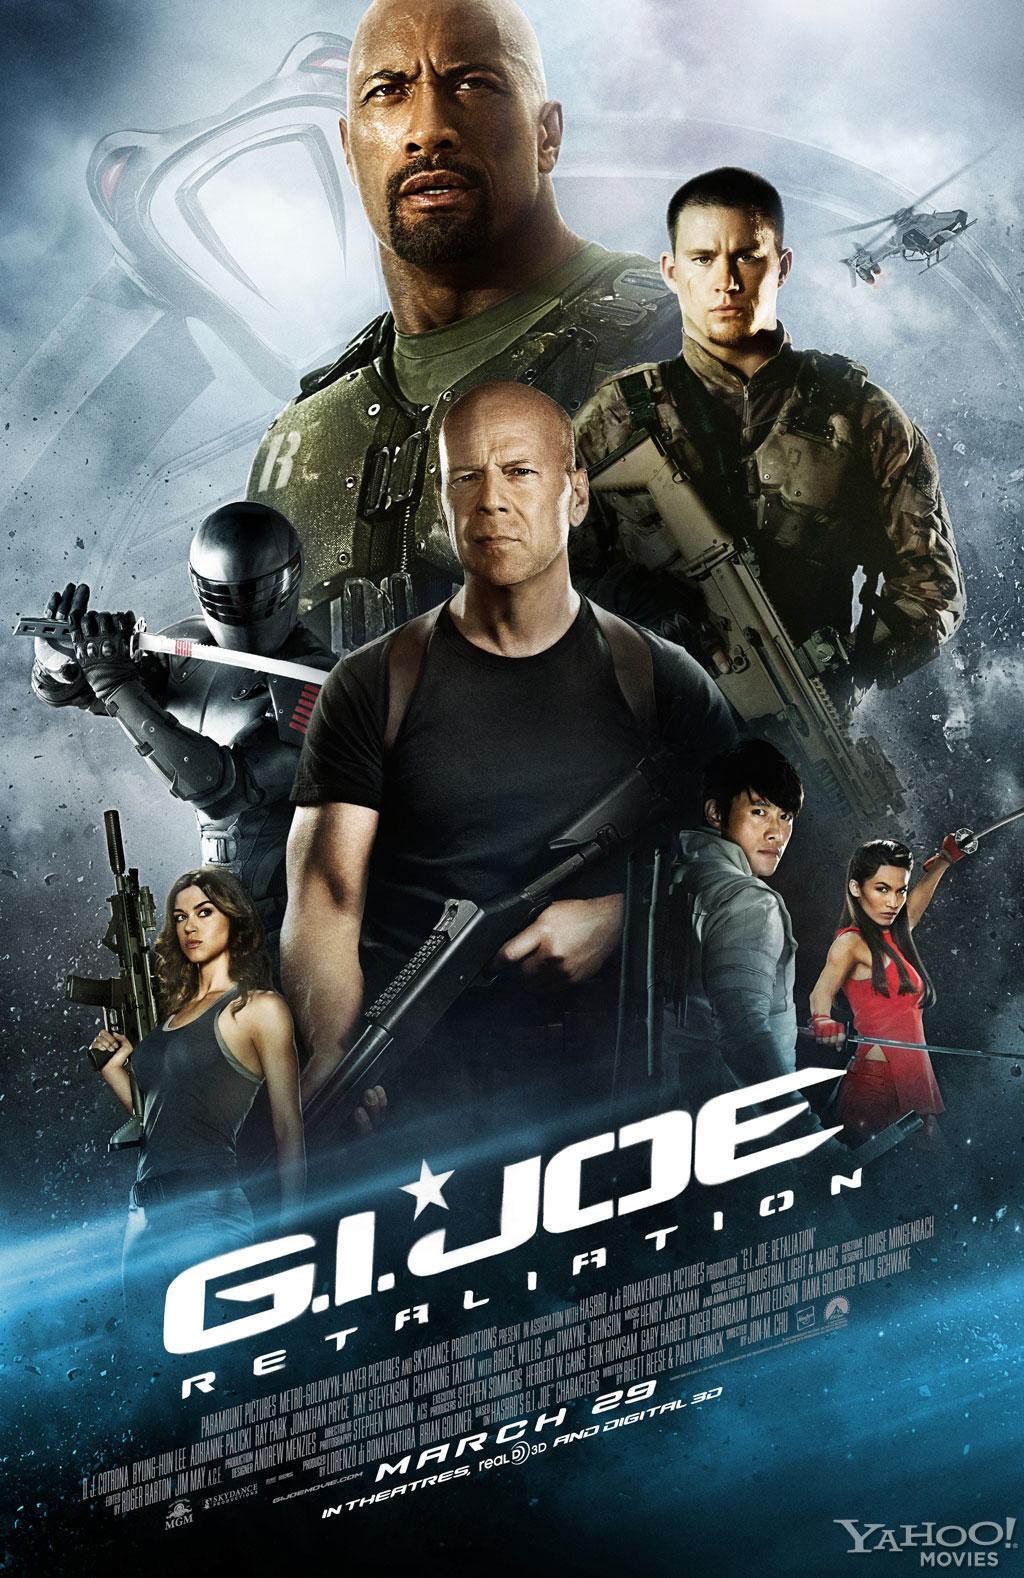 g.i. joe: retaliation - hd-trailers (hdtn)